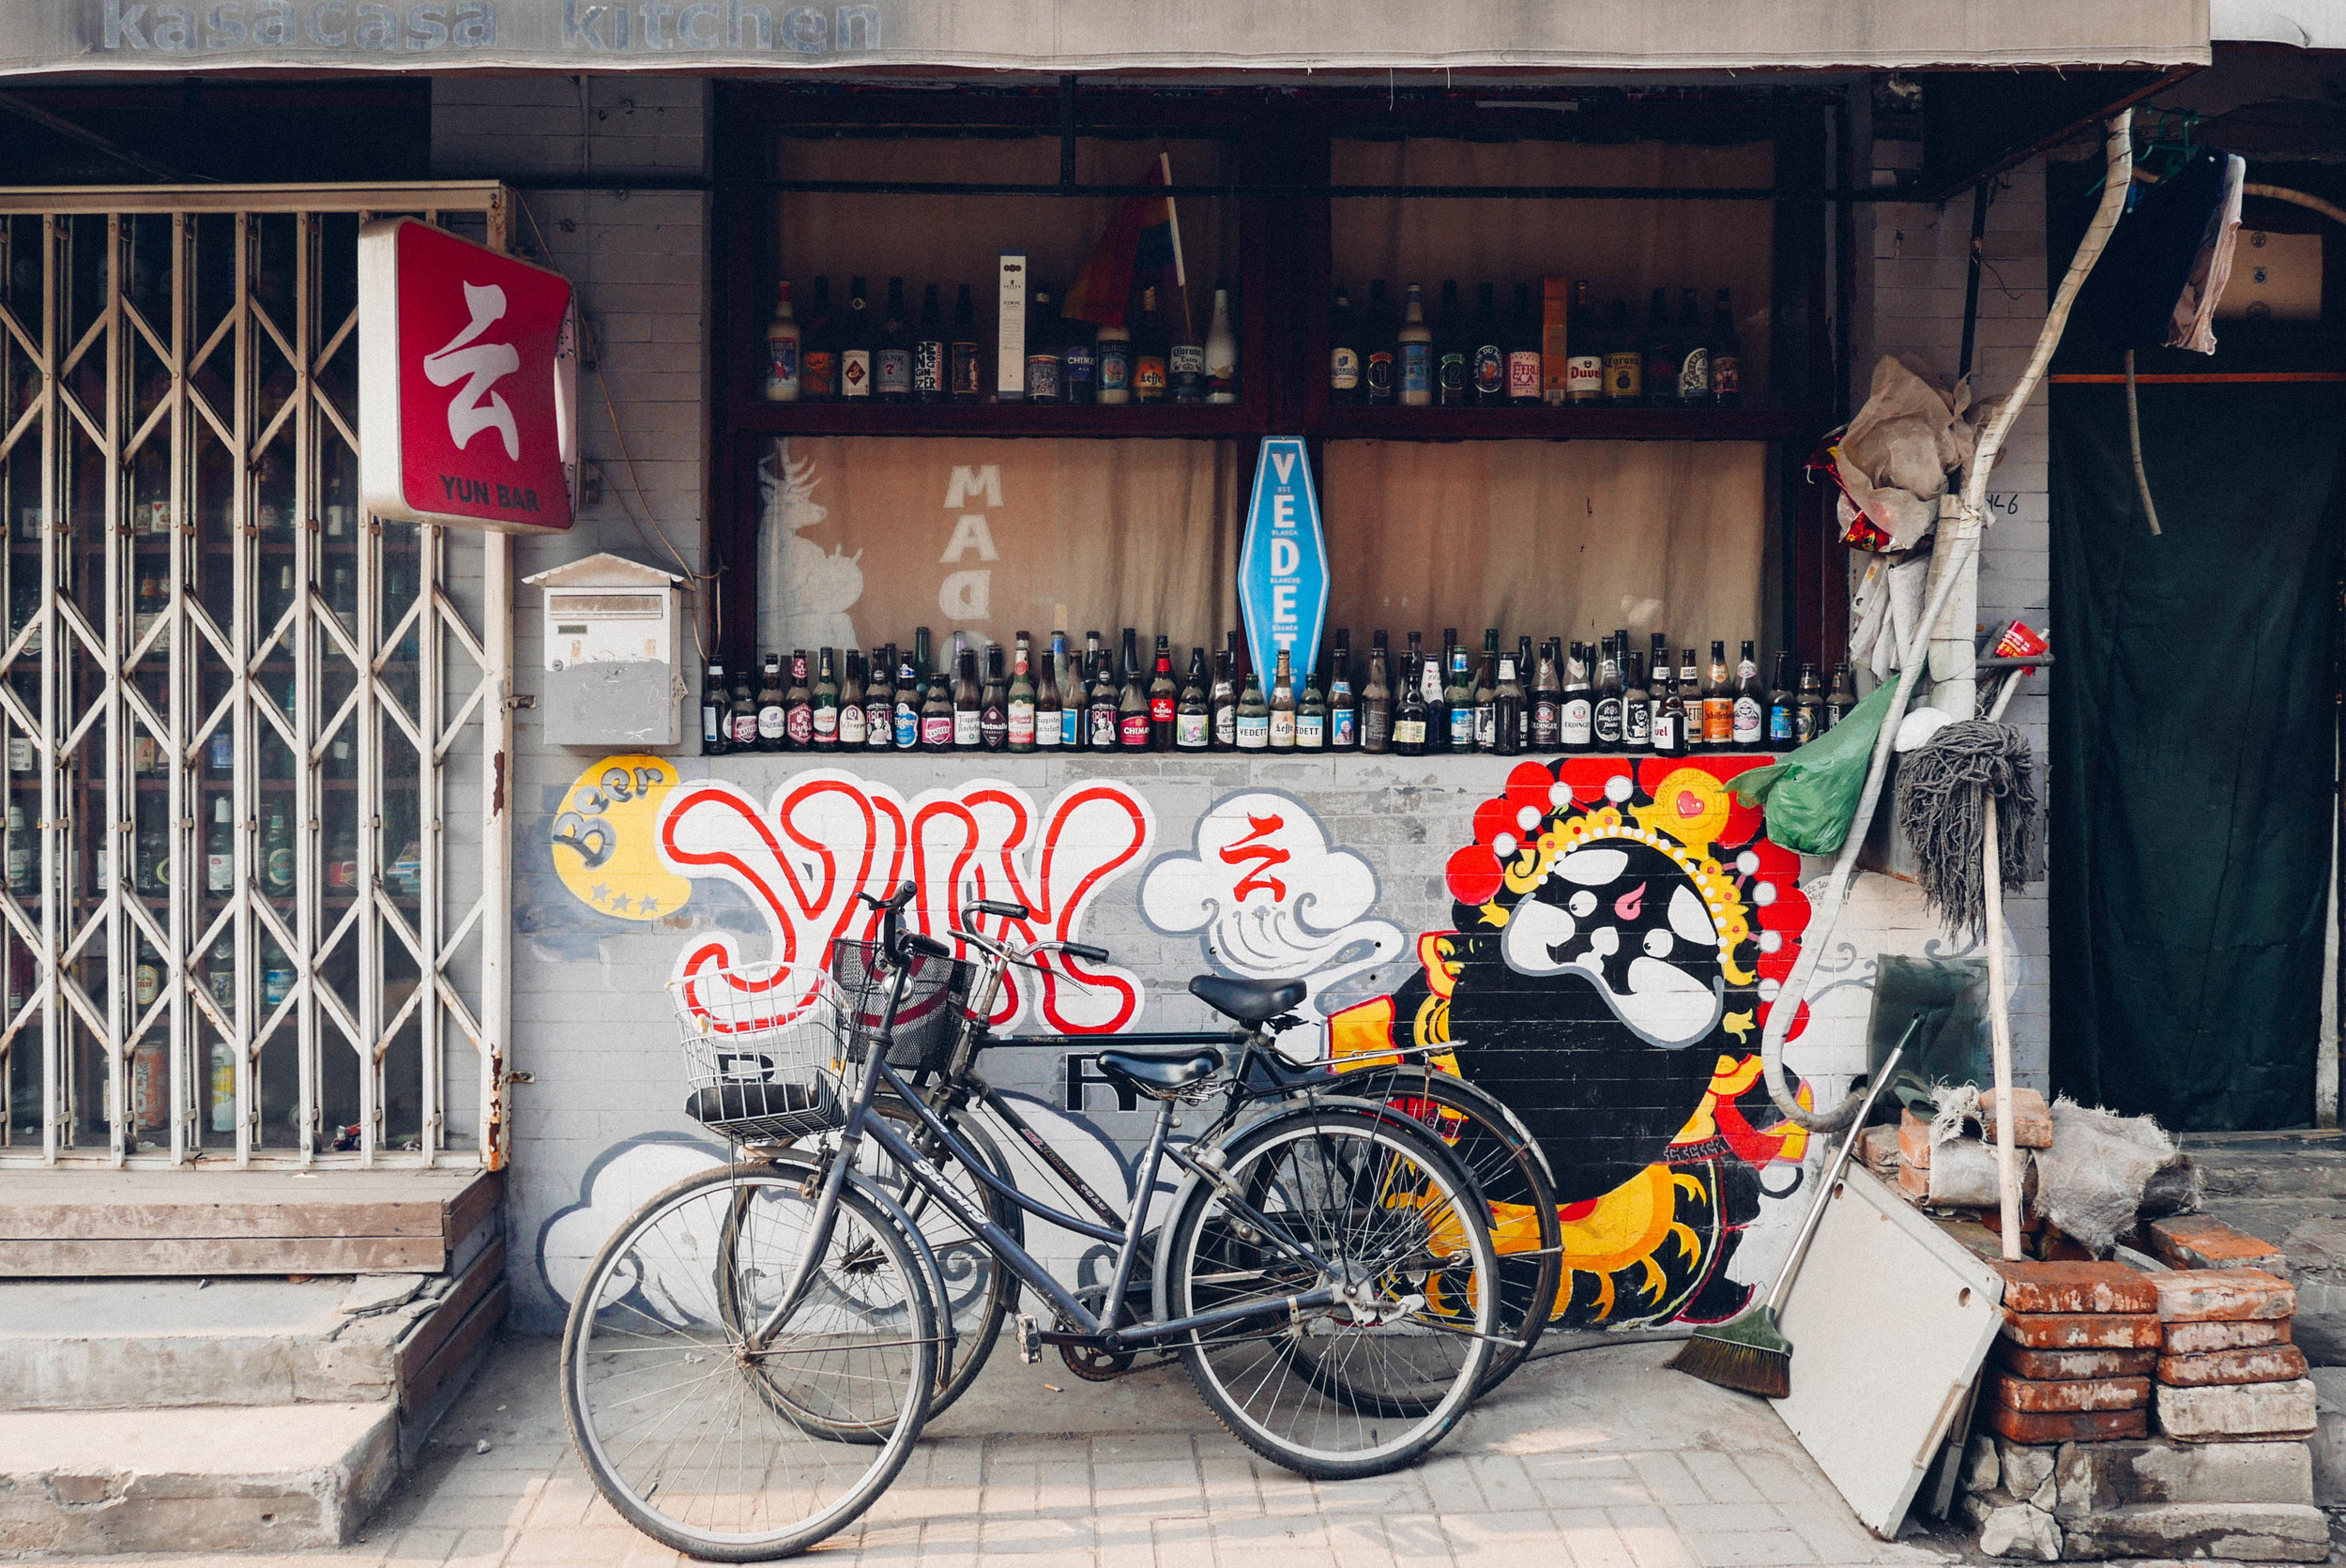 Hutong bar art.